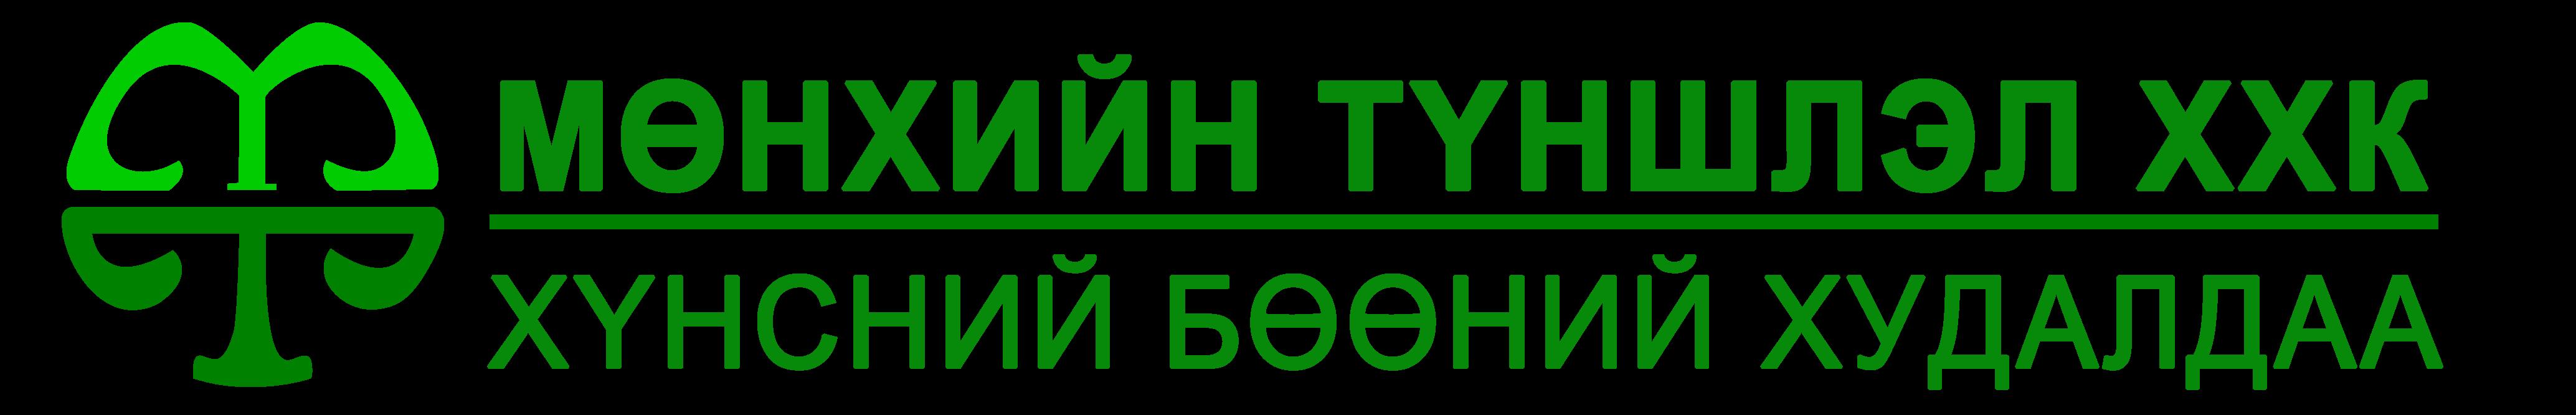 http://www.tunshlel.mn/front/image/logo/mnlogo.png